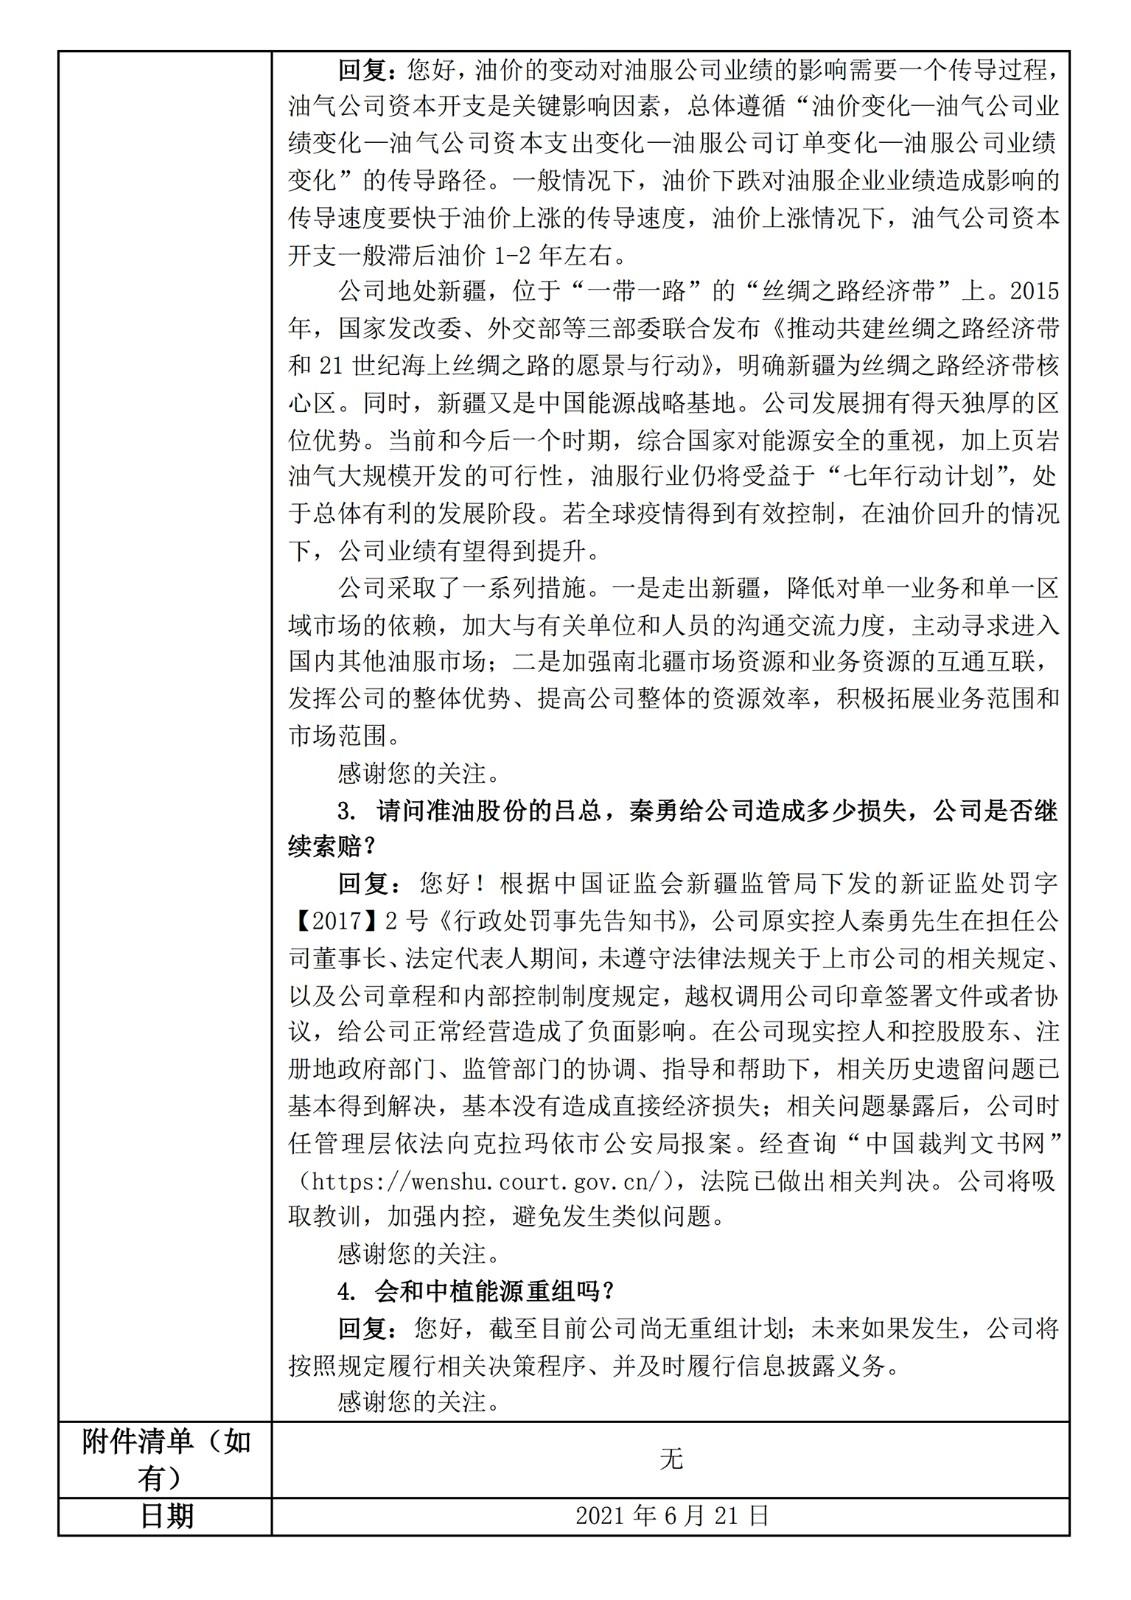 page2_1.jpg